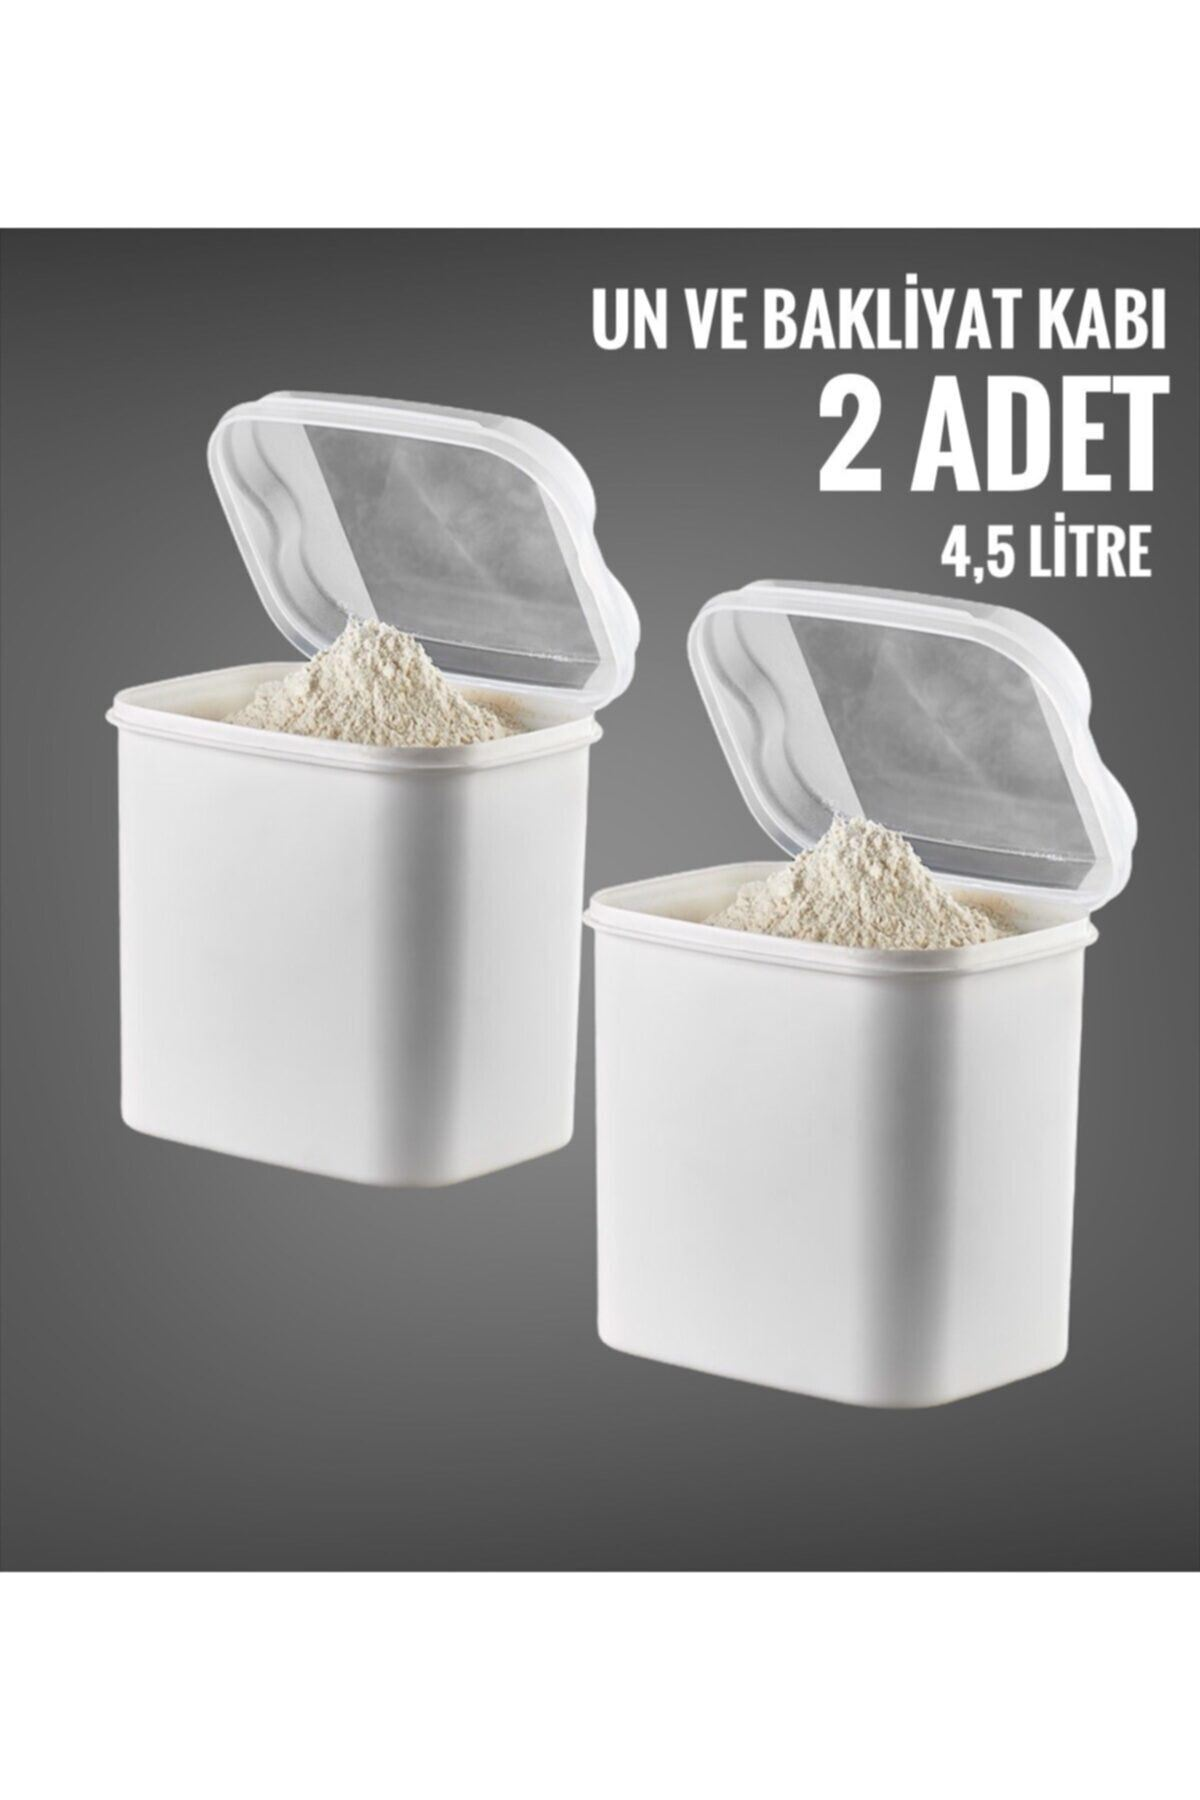 Vip Ahmet 2 Li Un ve Bakliyat Kabı 4,5 Litre Beyaz